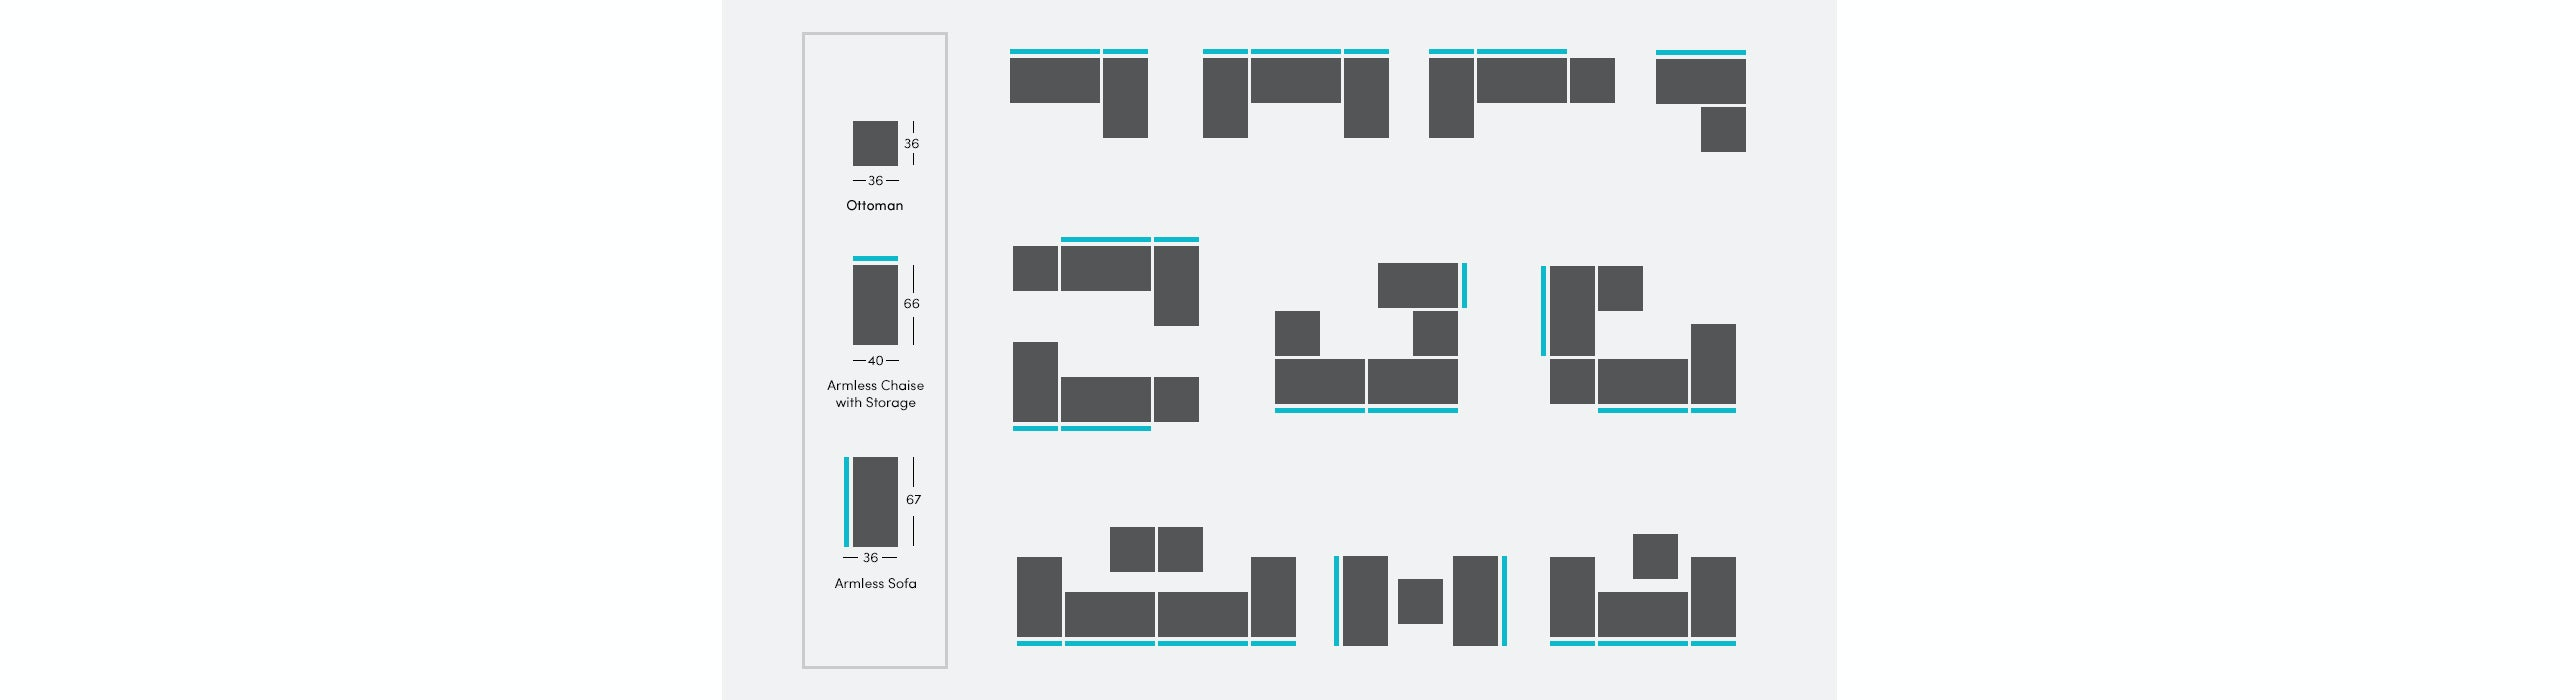 Popular Configurations